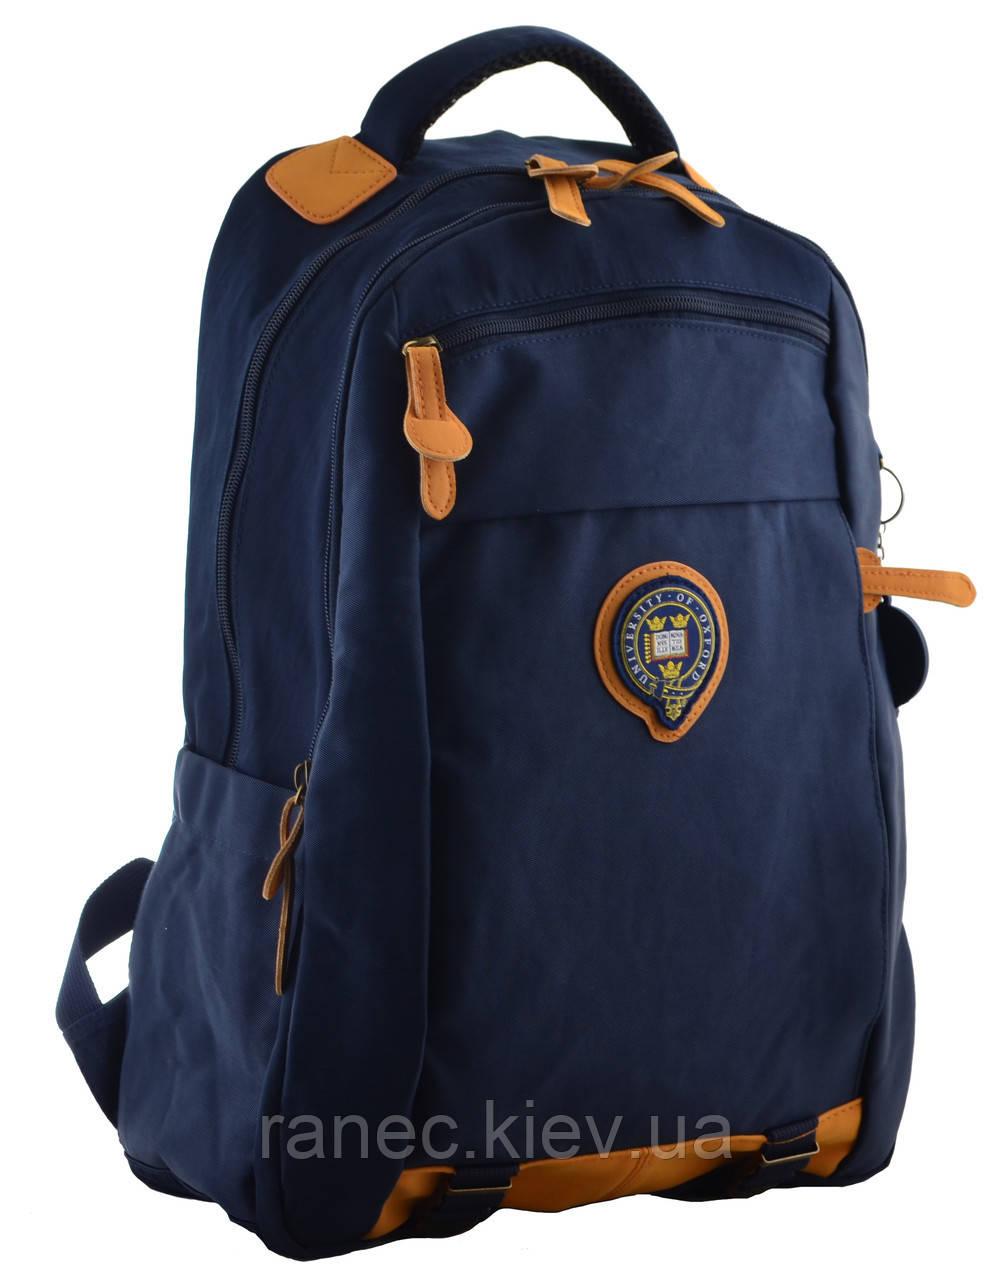 555618 Рюкзак молодежный OX 349, 46*29.5*13, синий YES